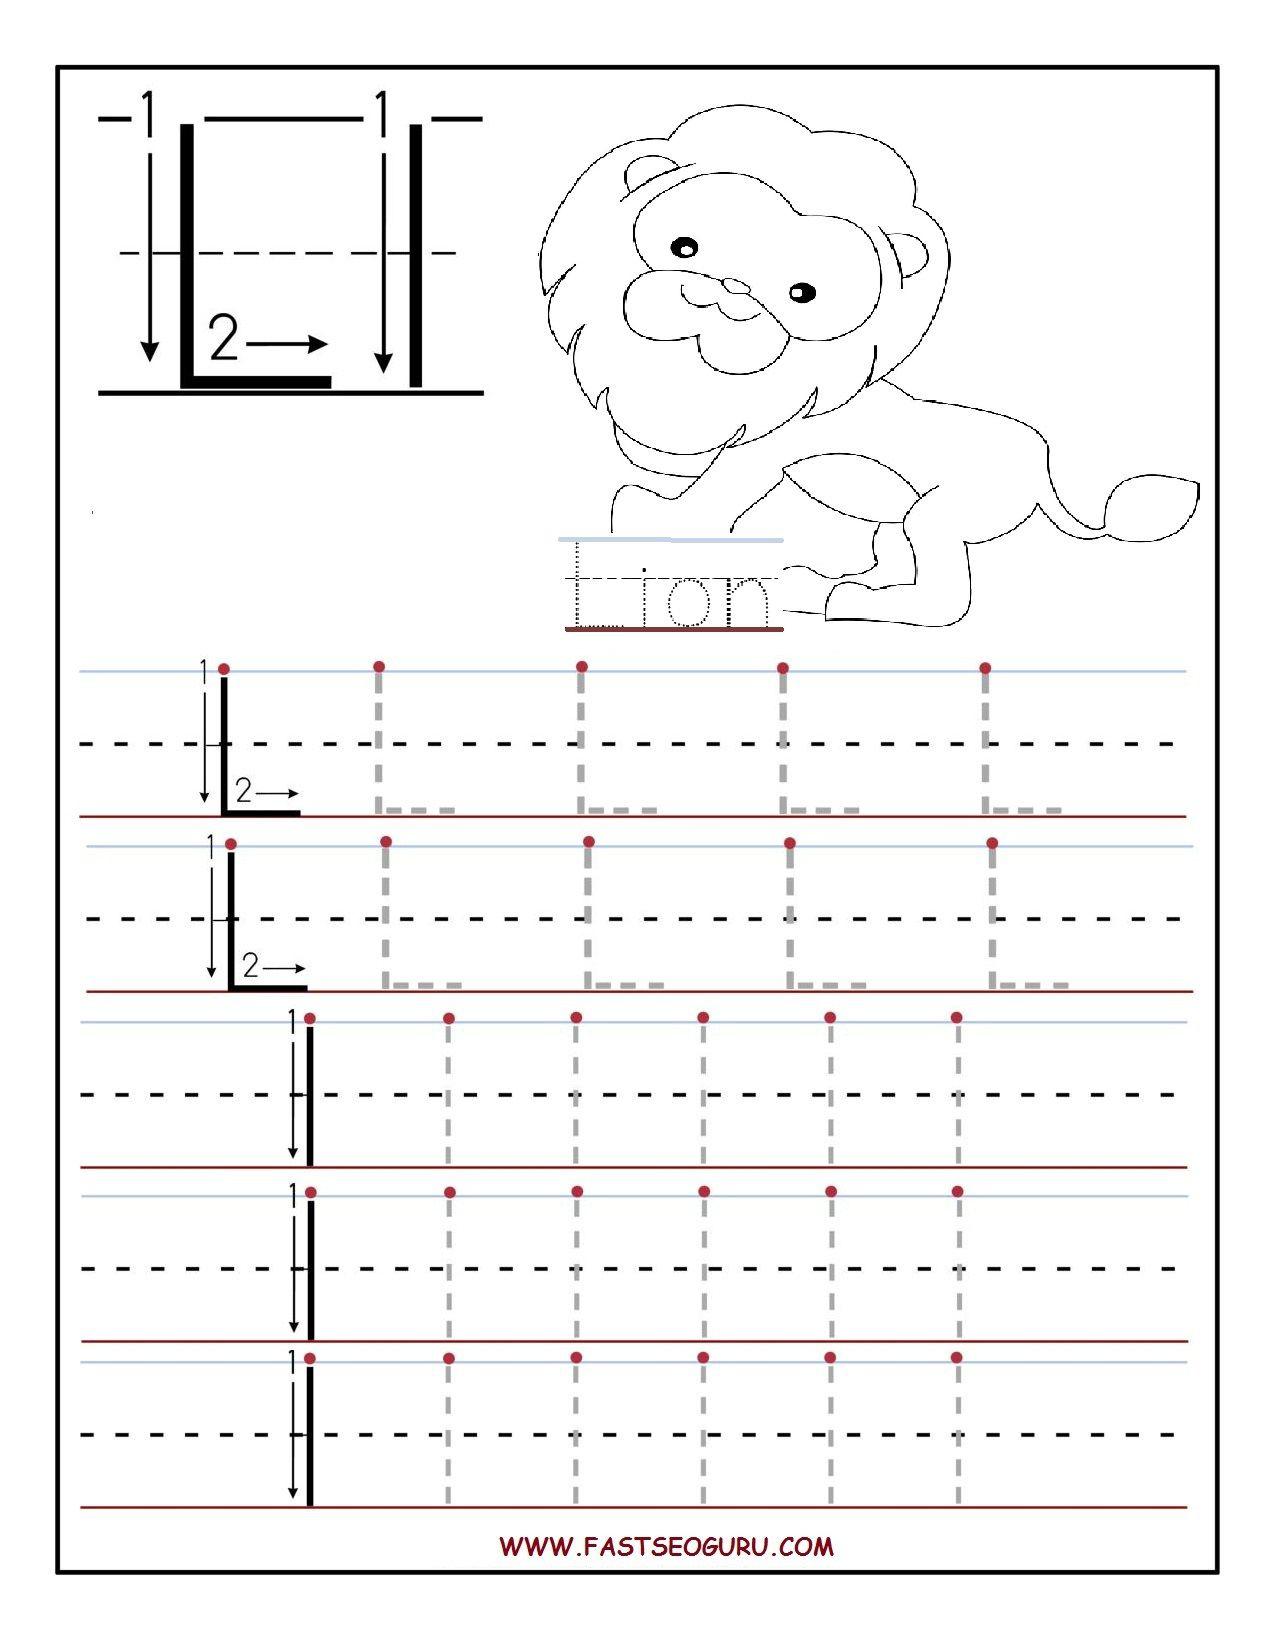 Printable Letter L Tracing Worksheets For Preschool pertaining to Letter L Tracing Worksheet